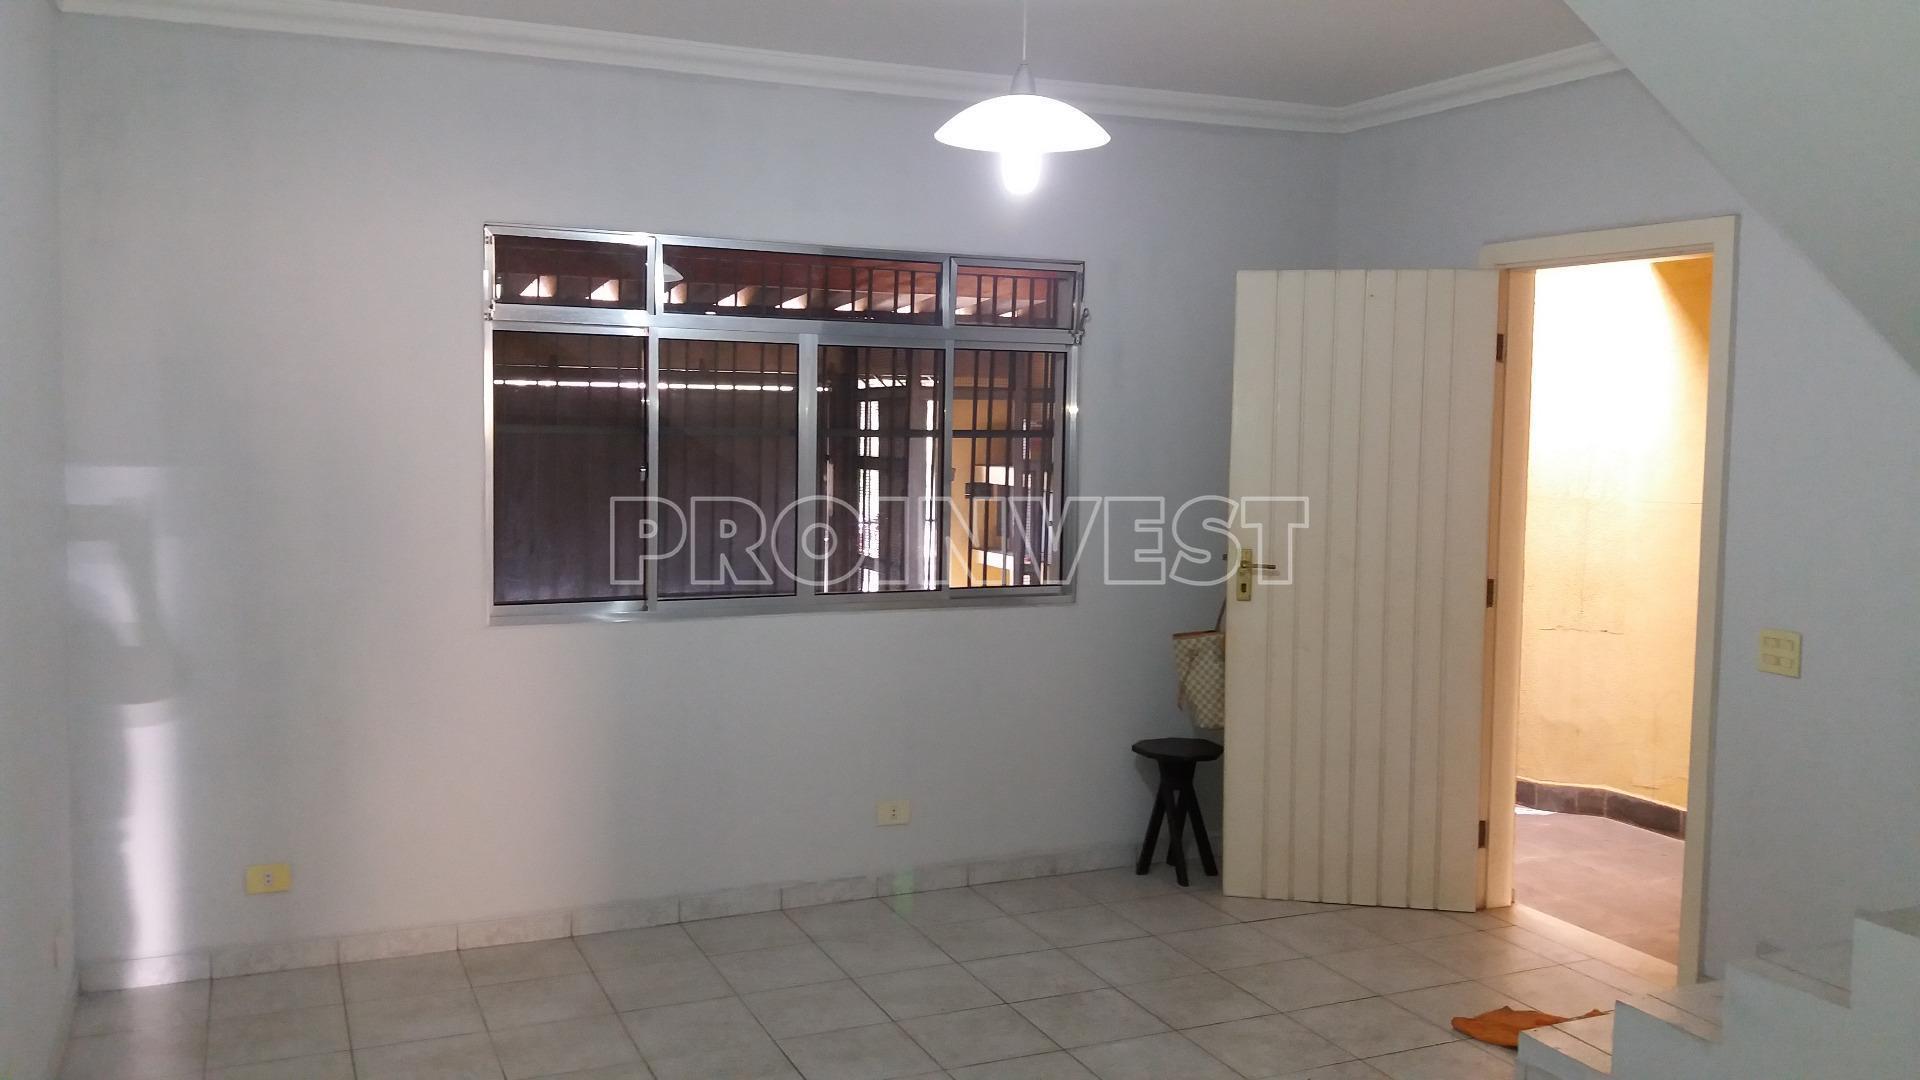 Casa de 3 dormitórios à venda em Granja Viana, Cotia - SP